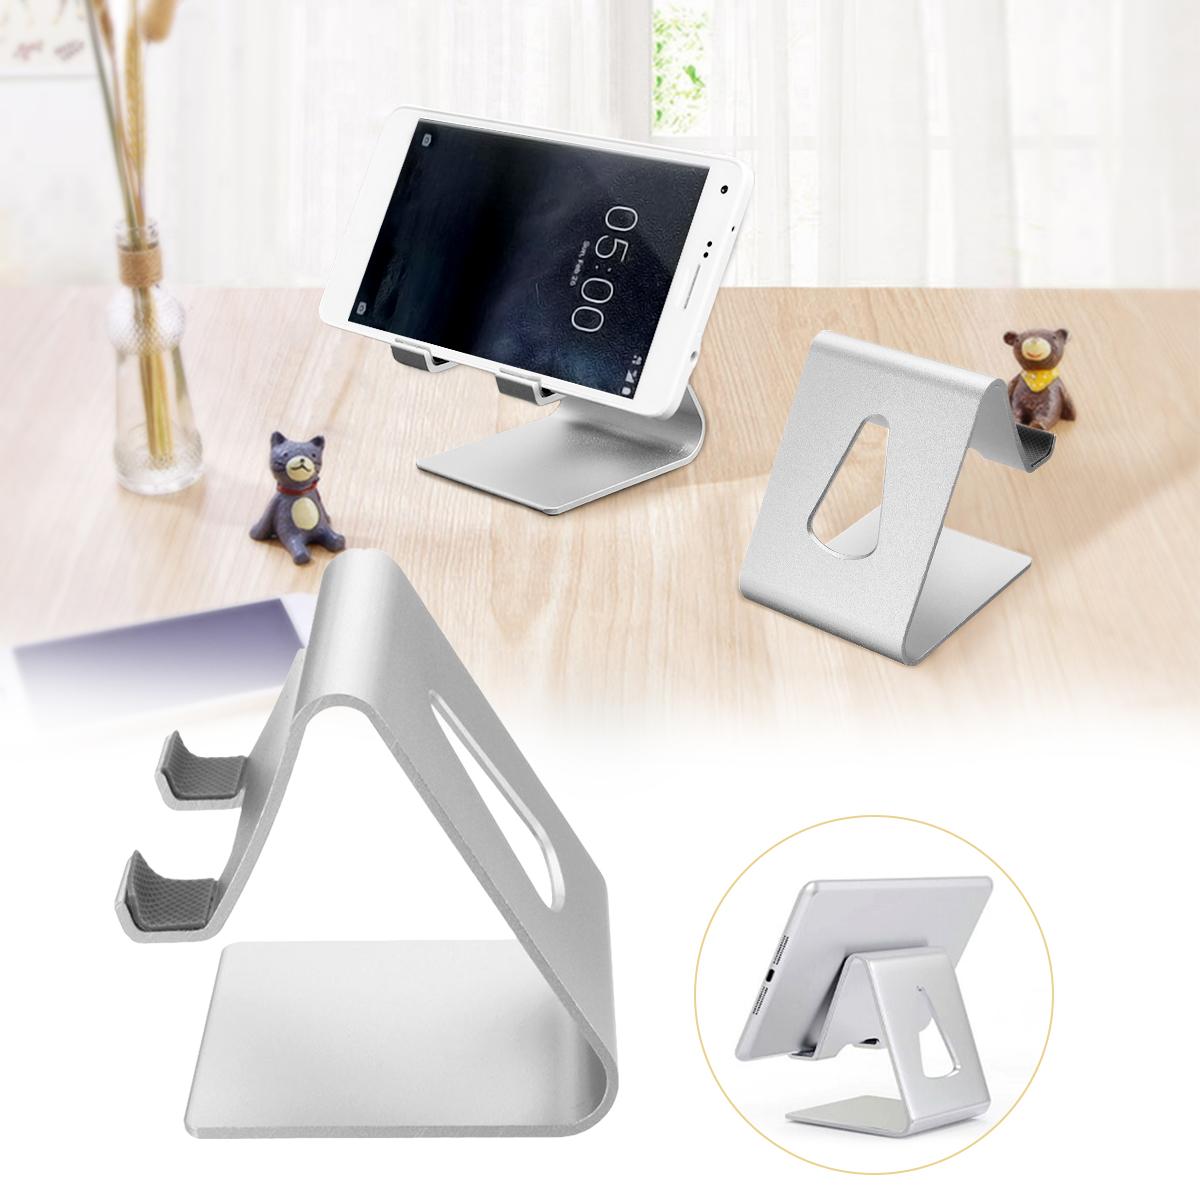 Universal Aluminium Desktop Phone Stand Lazy Holder Cradle Mount for iPad iPhone Samsung Xiaomi